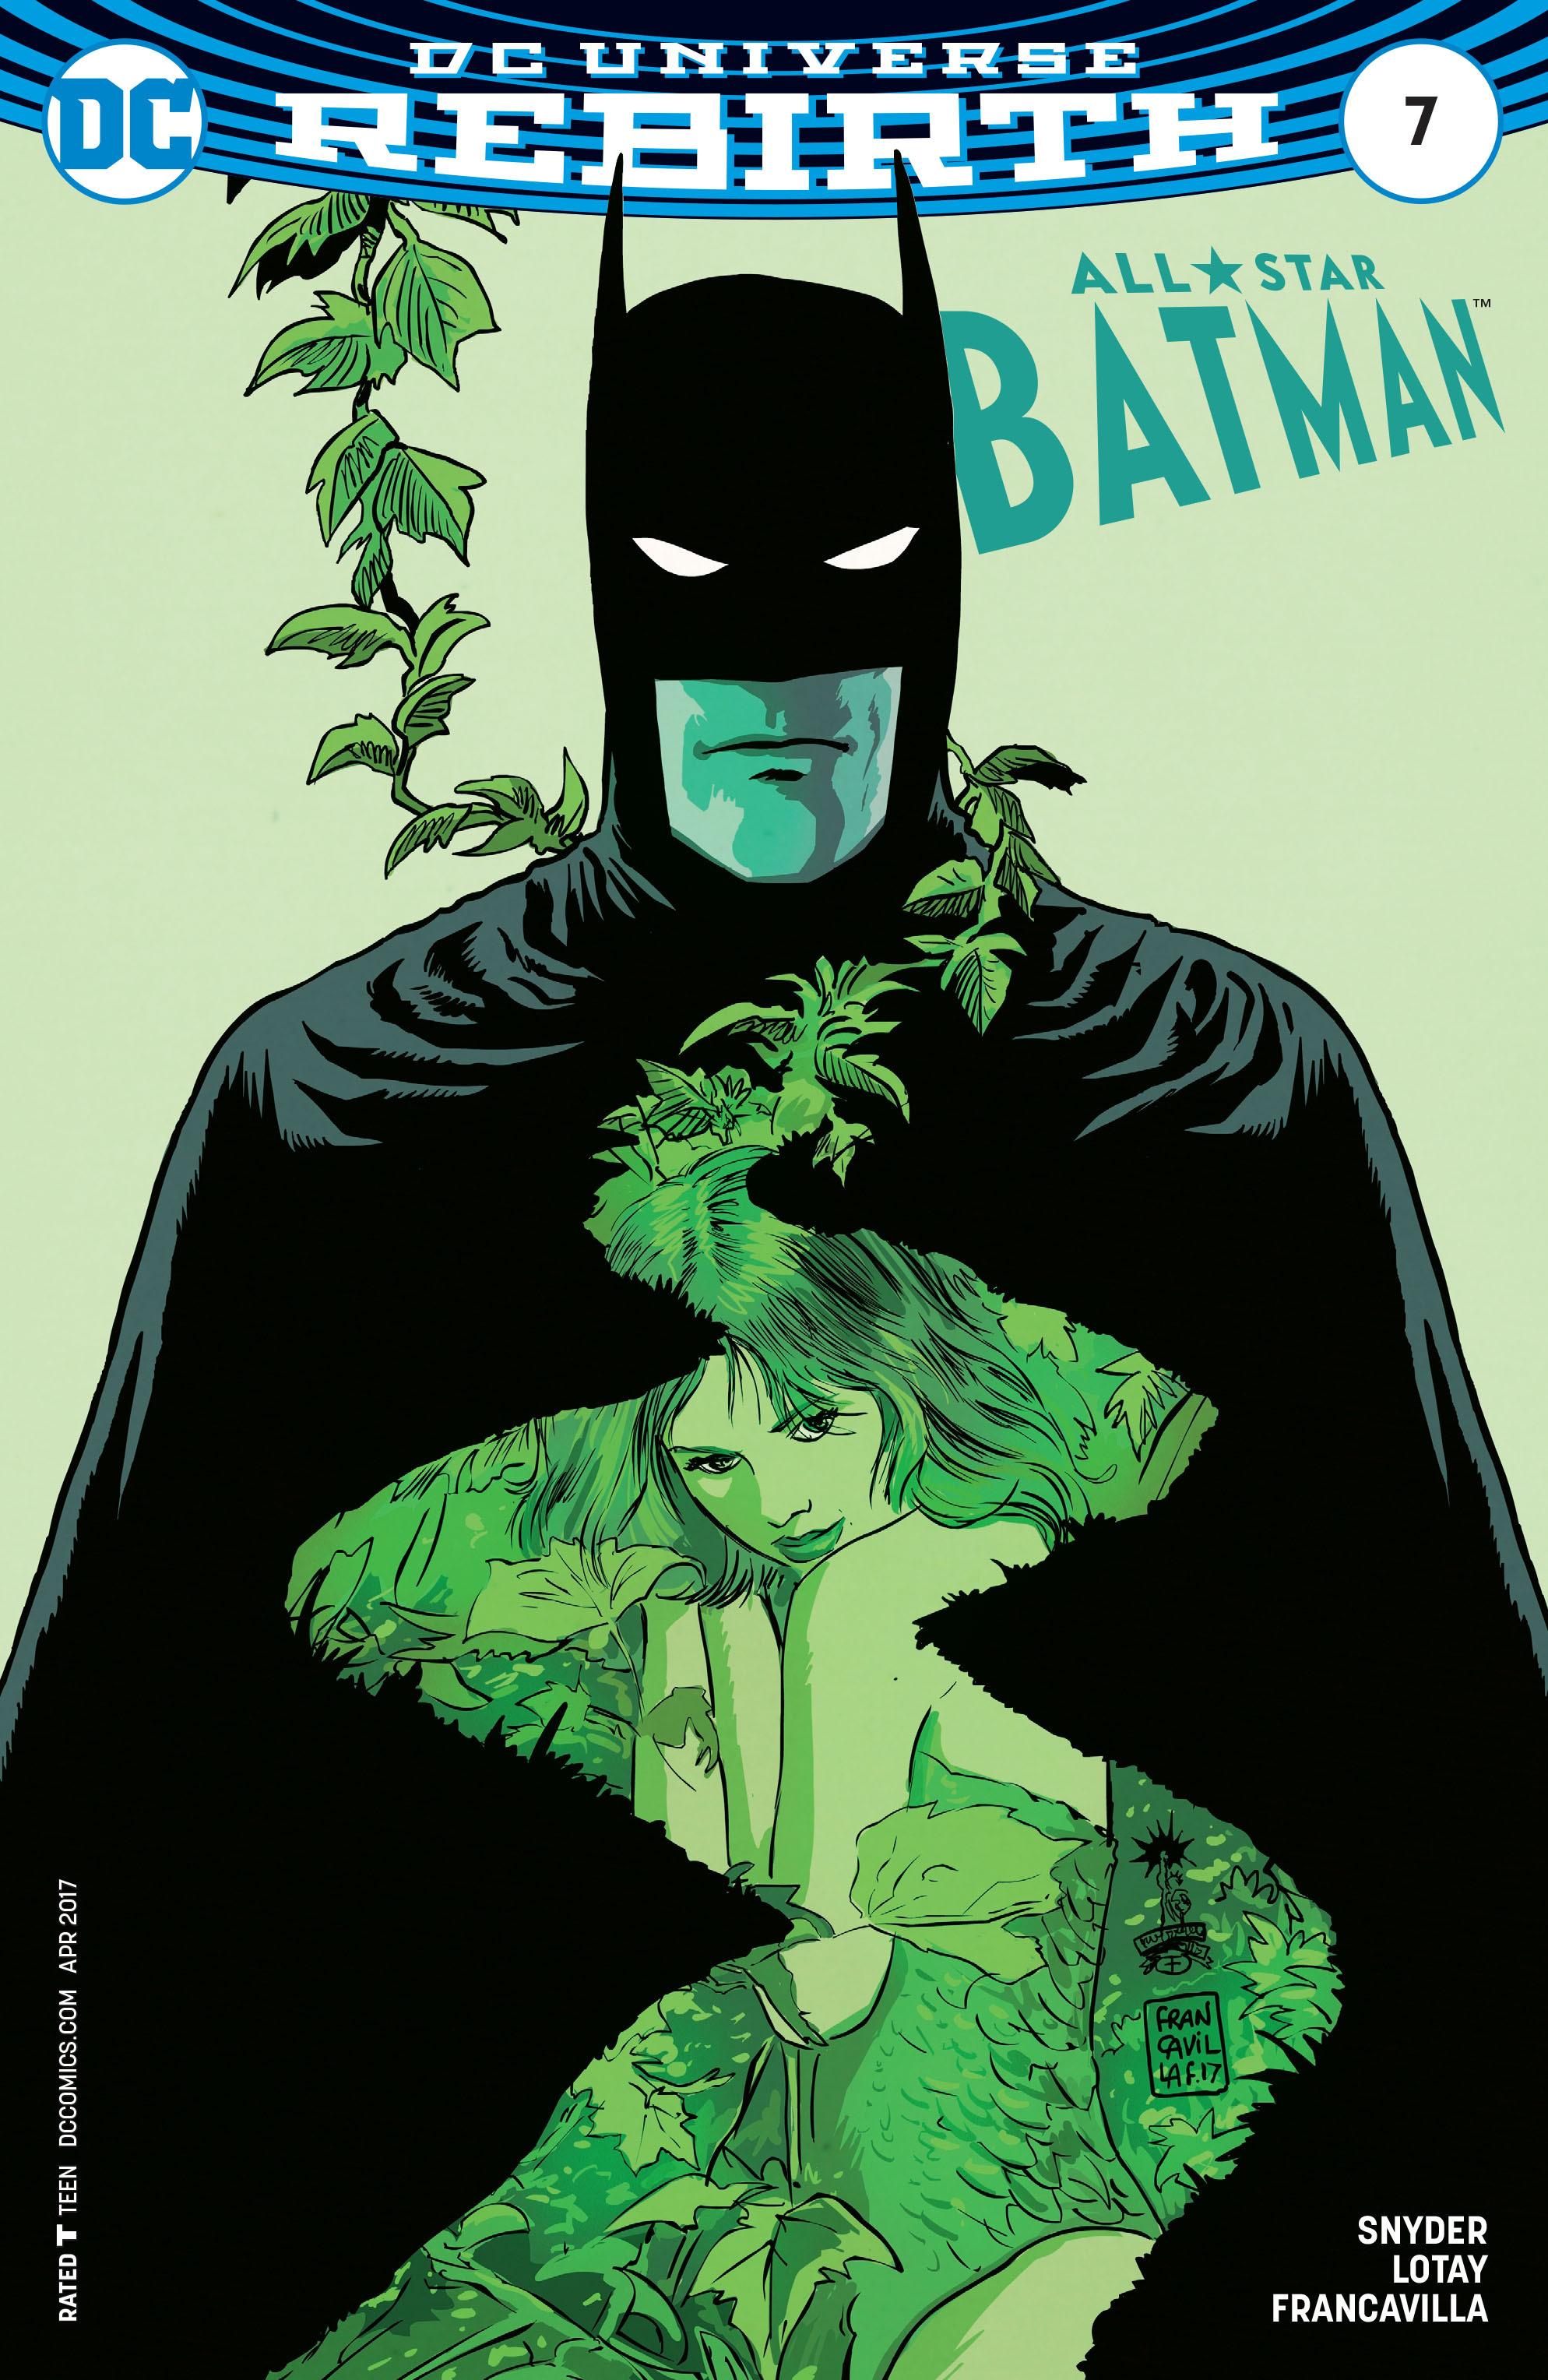 Read online All-Star Batman comic -  Issue #7 - 3